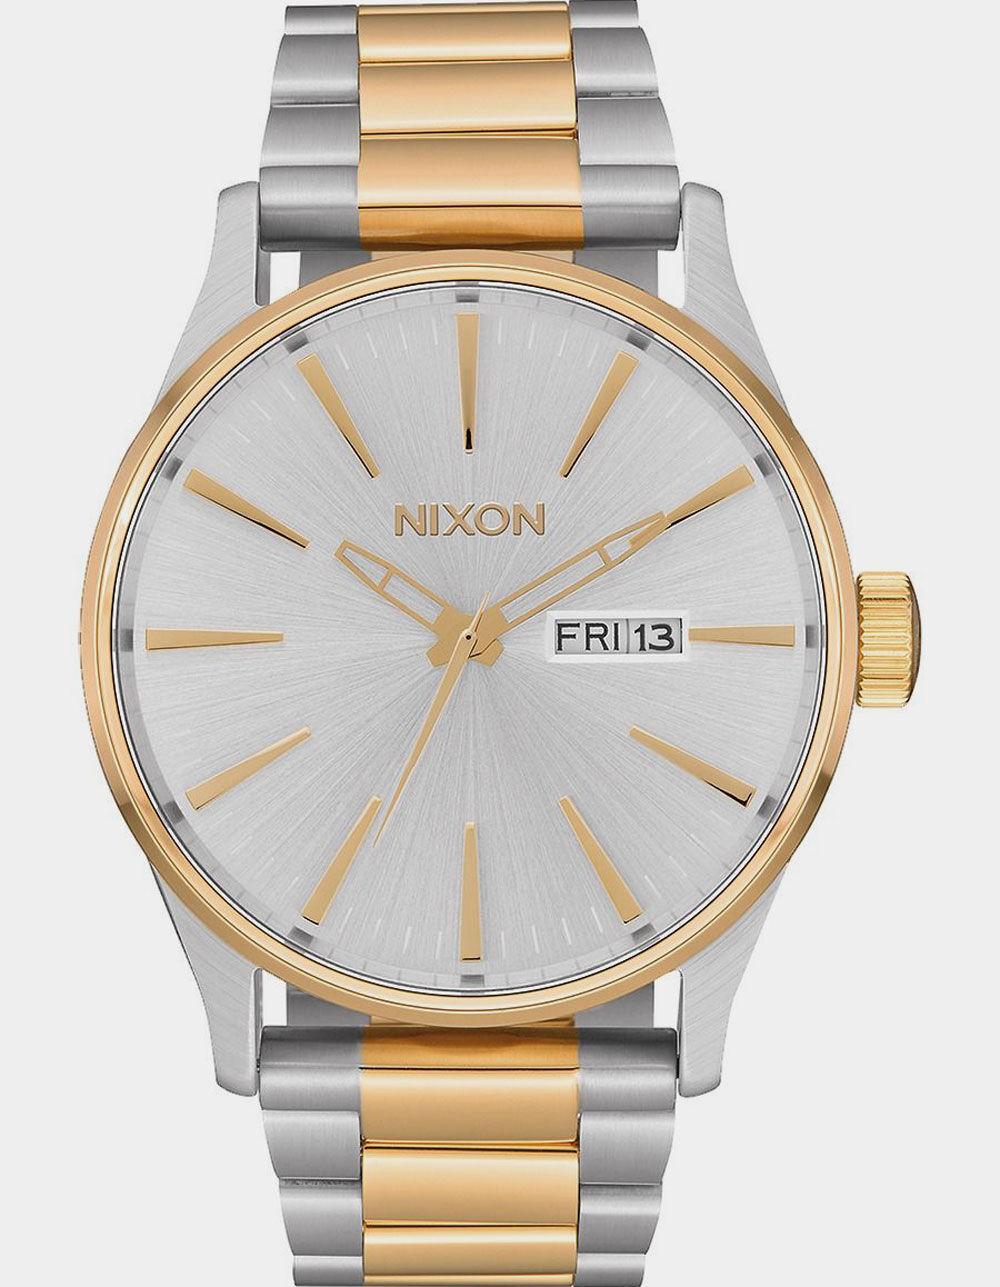 NIXON Sentry SS Silver & Gold Watch